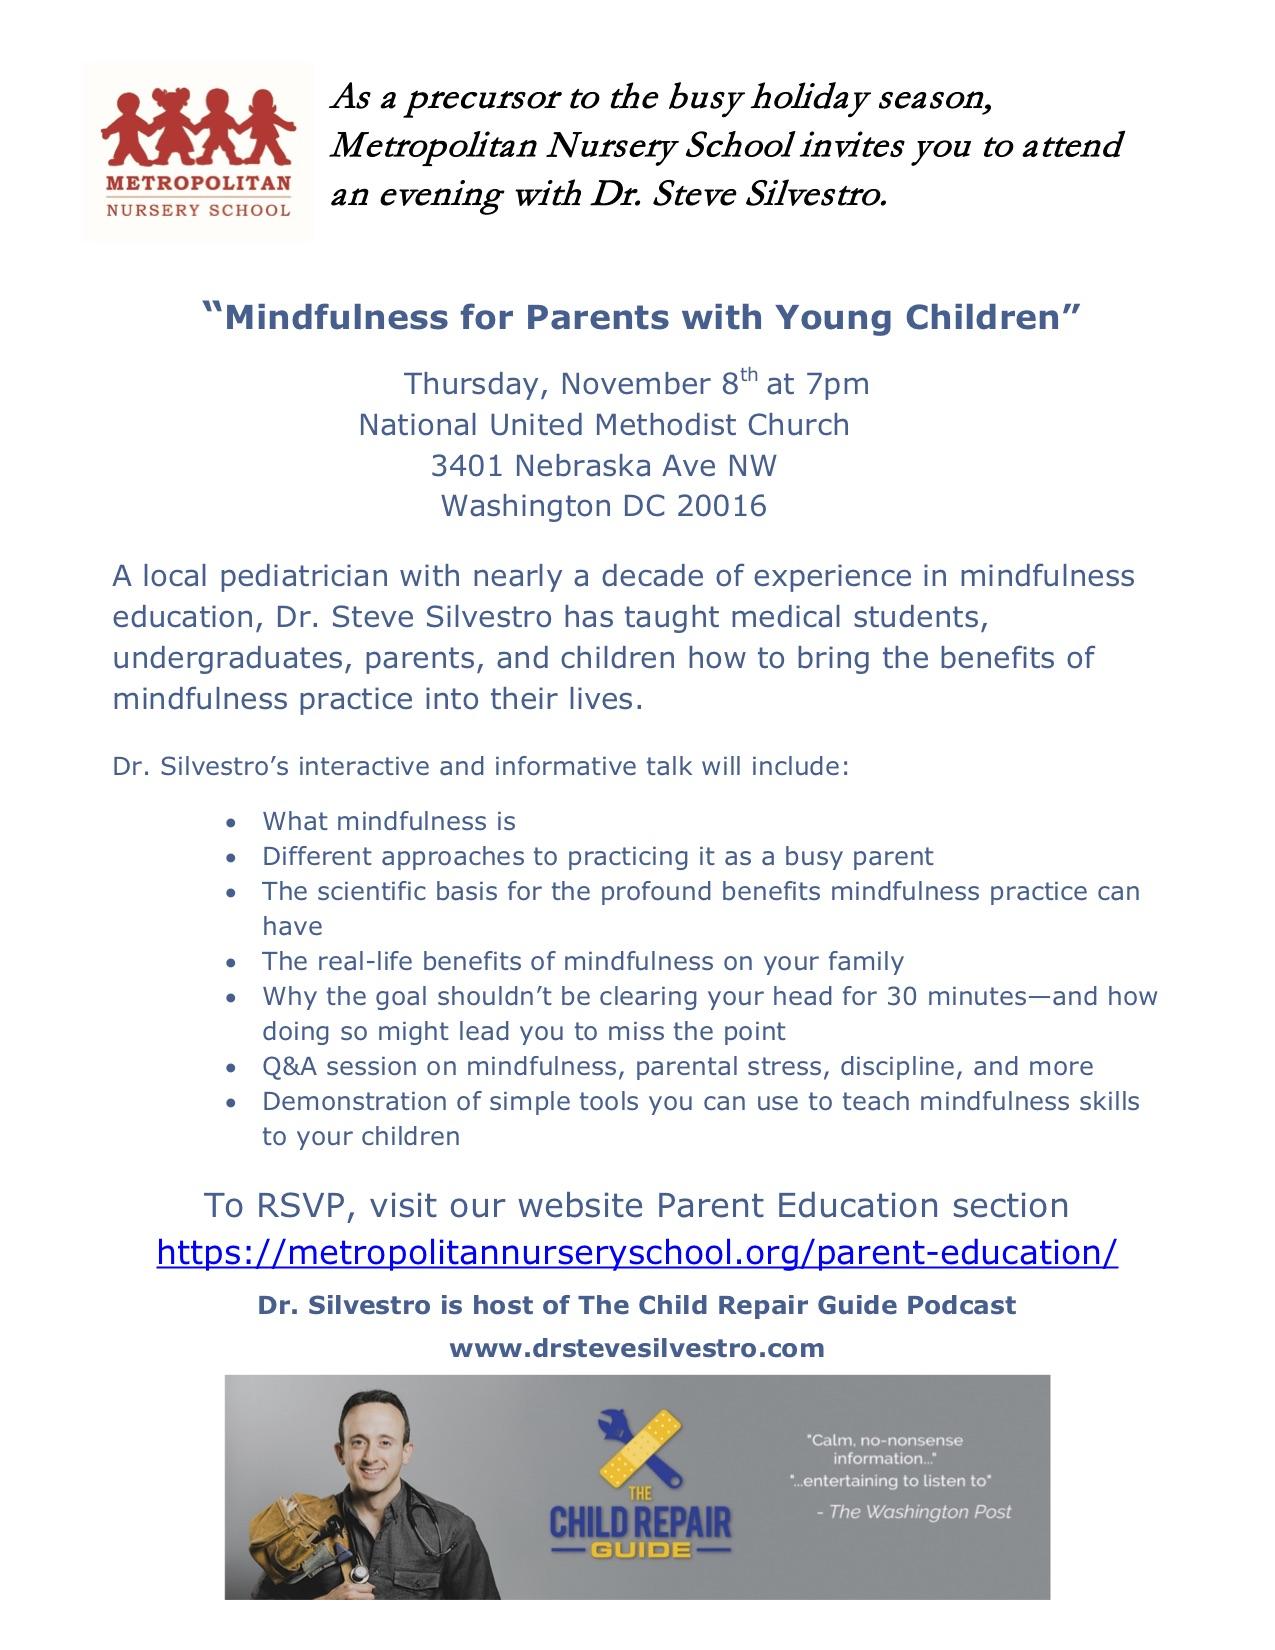 Mindfulness with Dr Steve Silvestro.jpg